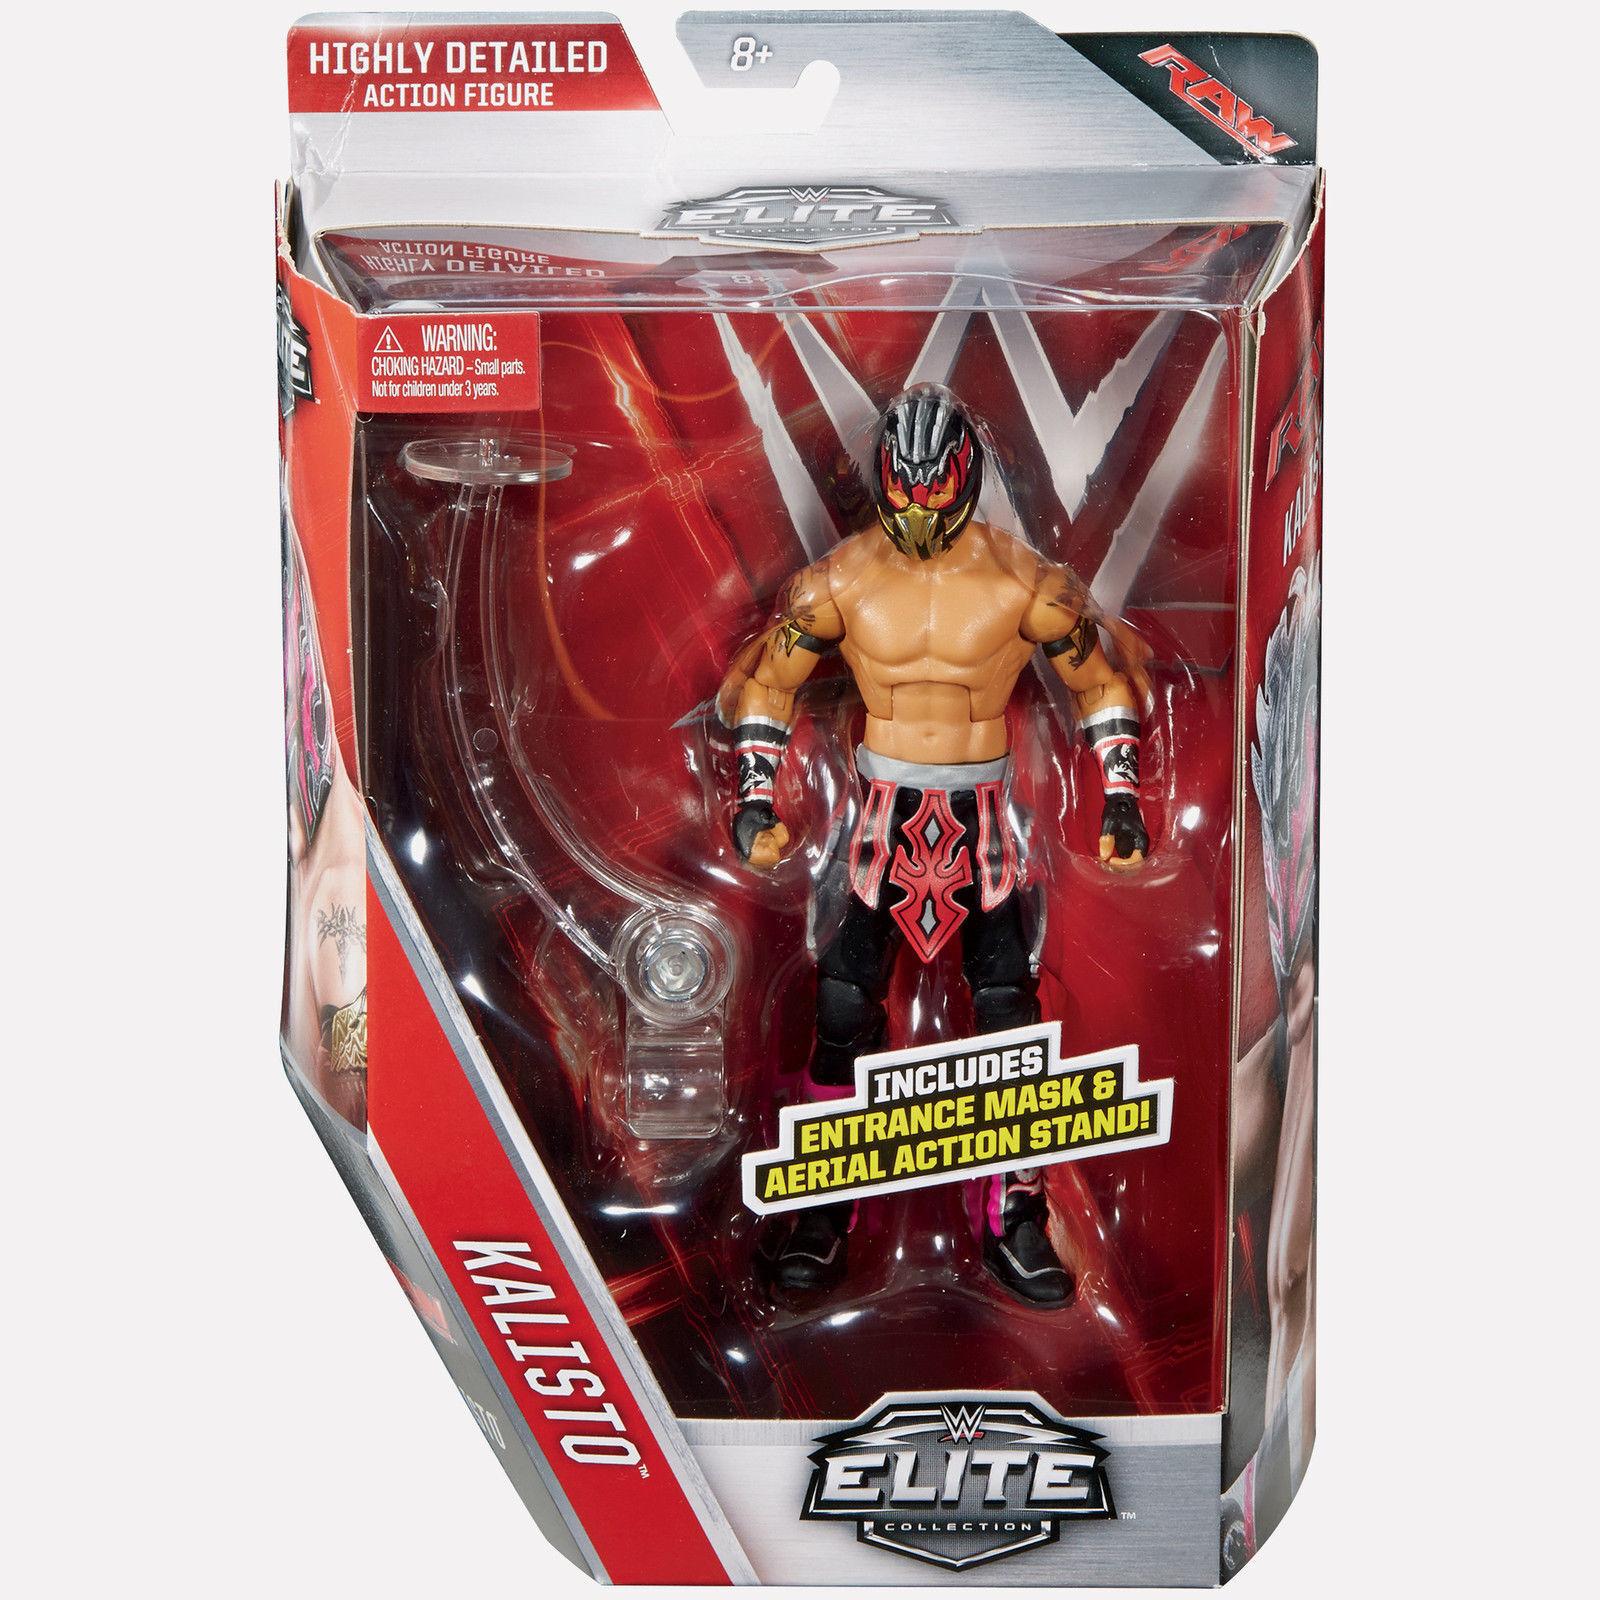 WWE ELITE SERIES 42 KALISTO WRESTLING FIGURE BRAND NEW BOXED